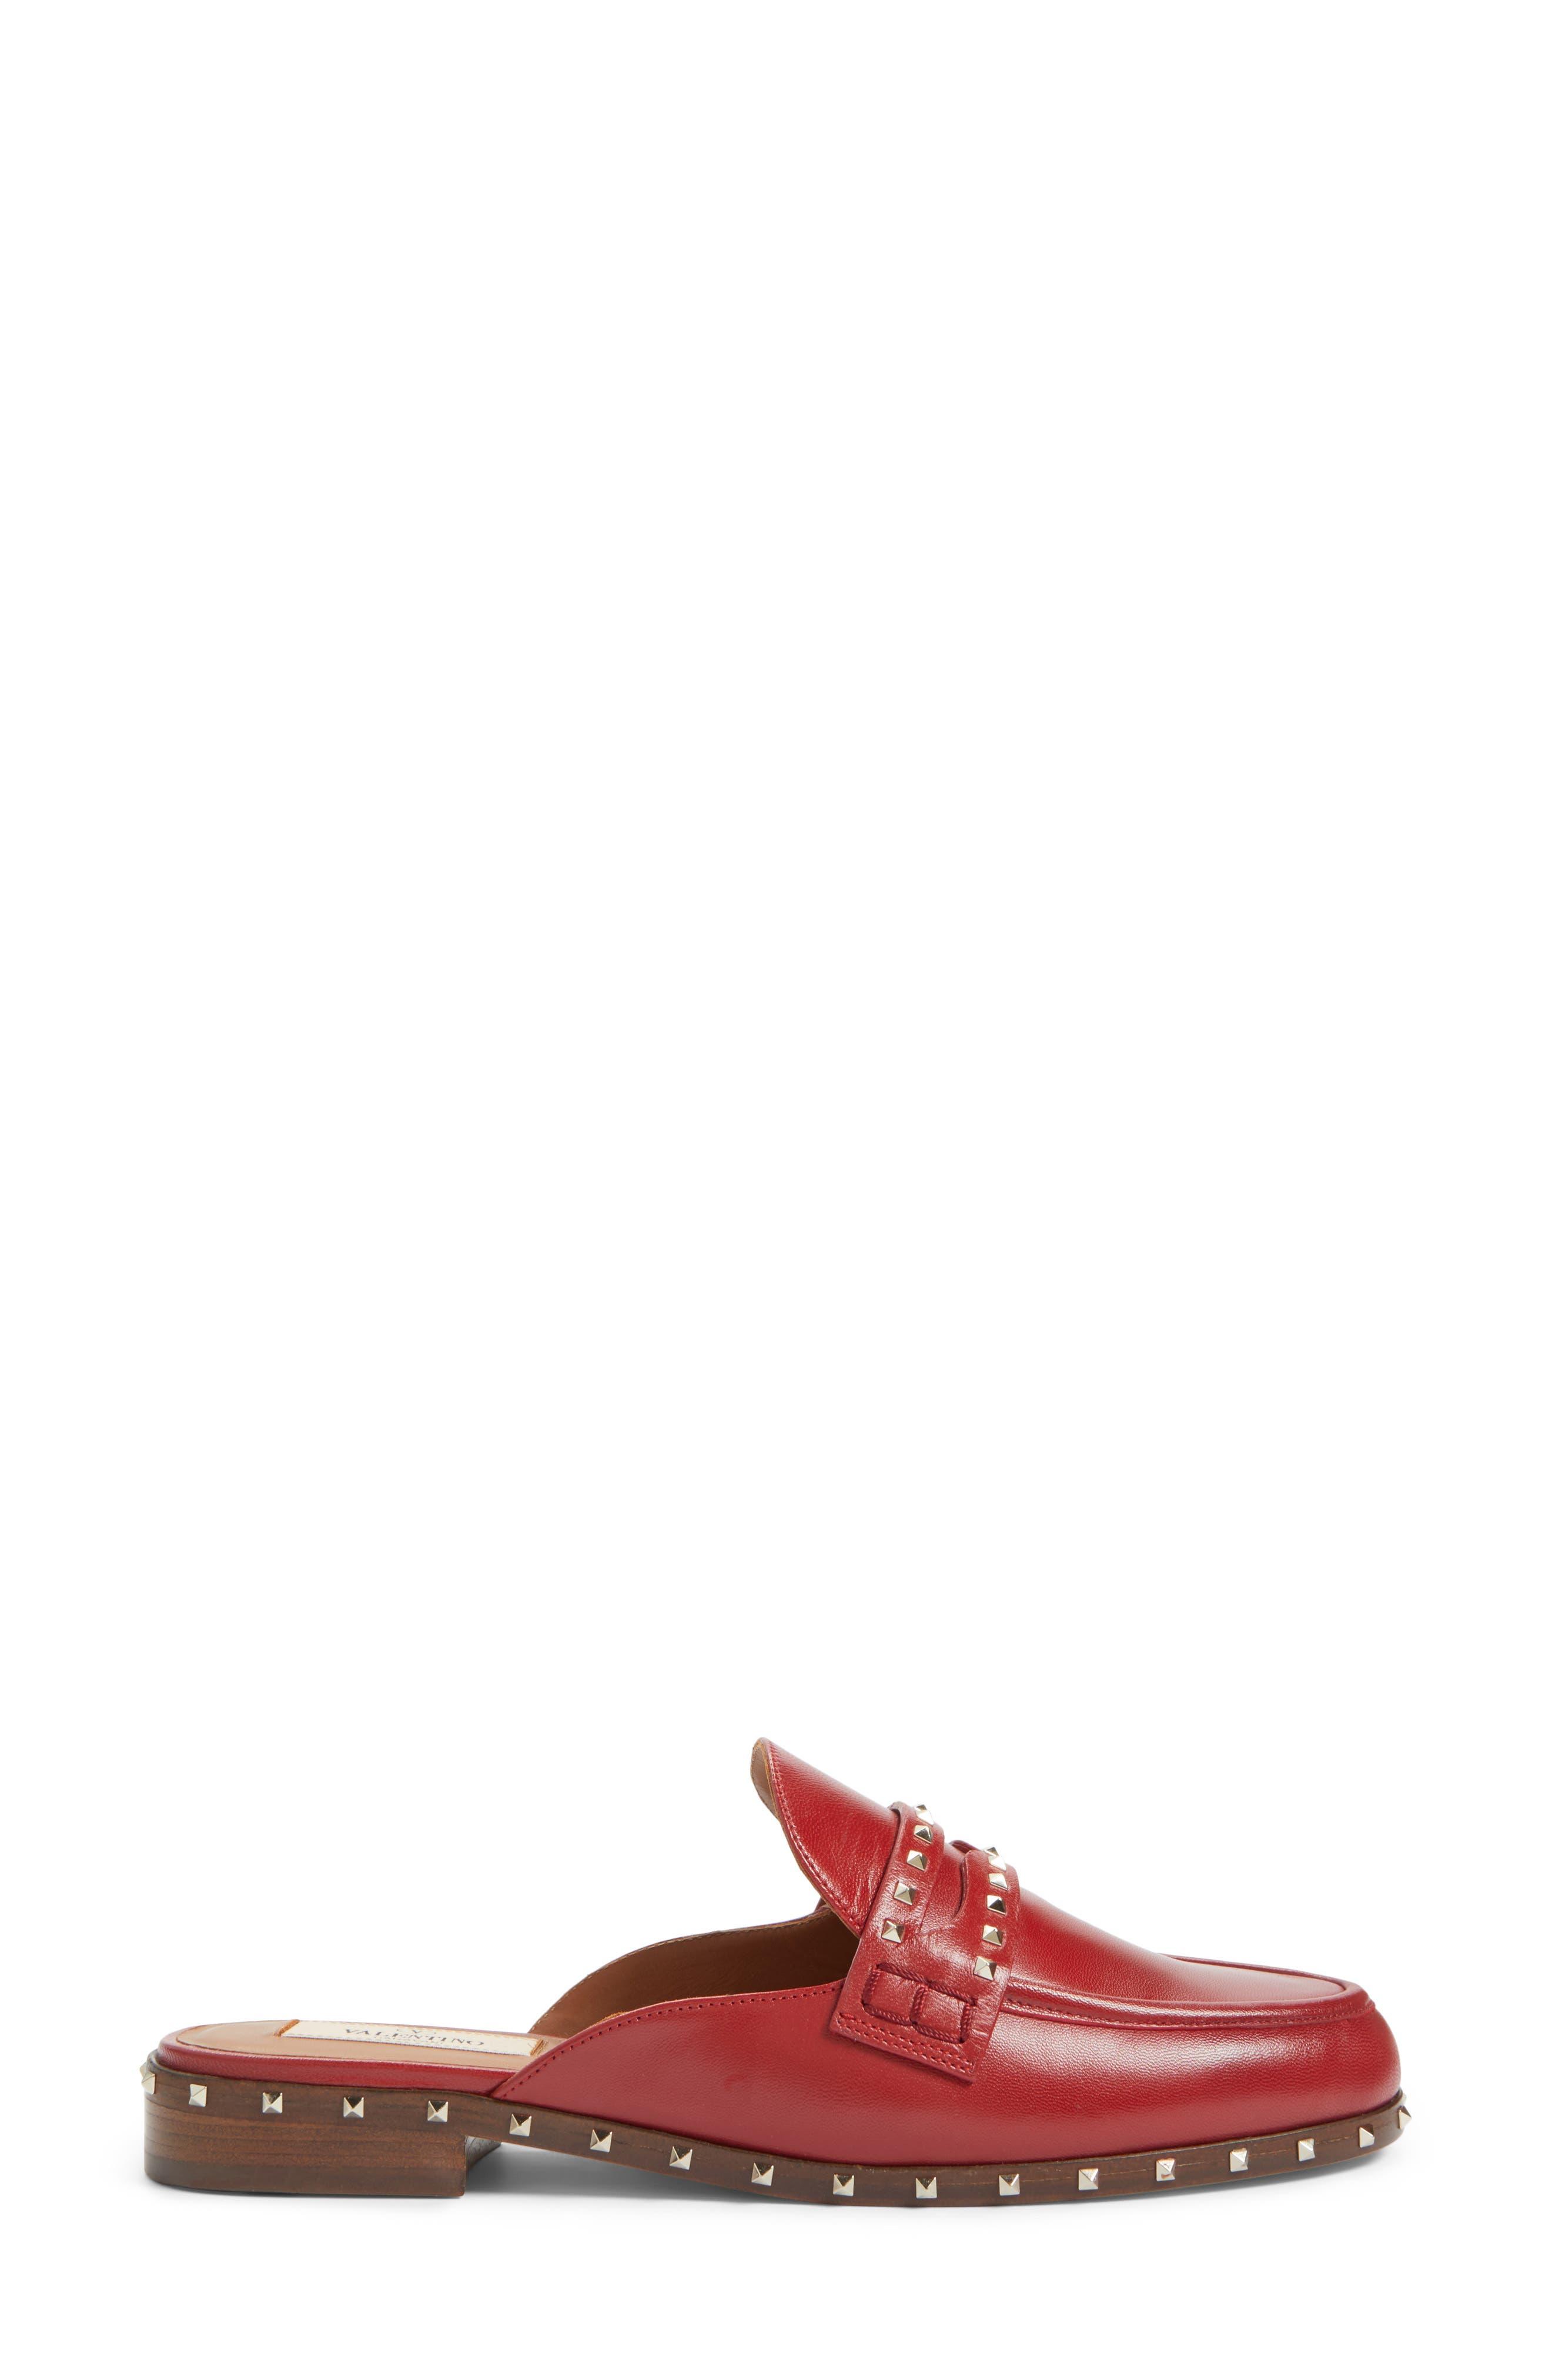 Soul Rockstud Loafer Mule,                             Alternate thumbnail 3, color,                             Red Leather